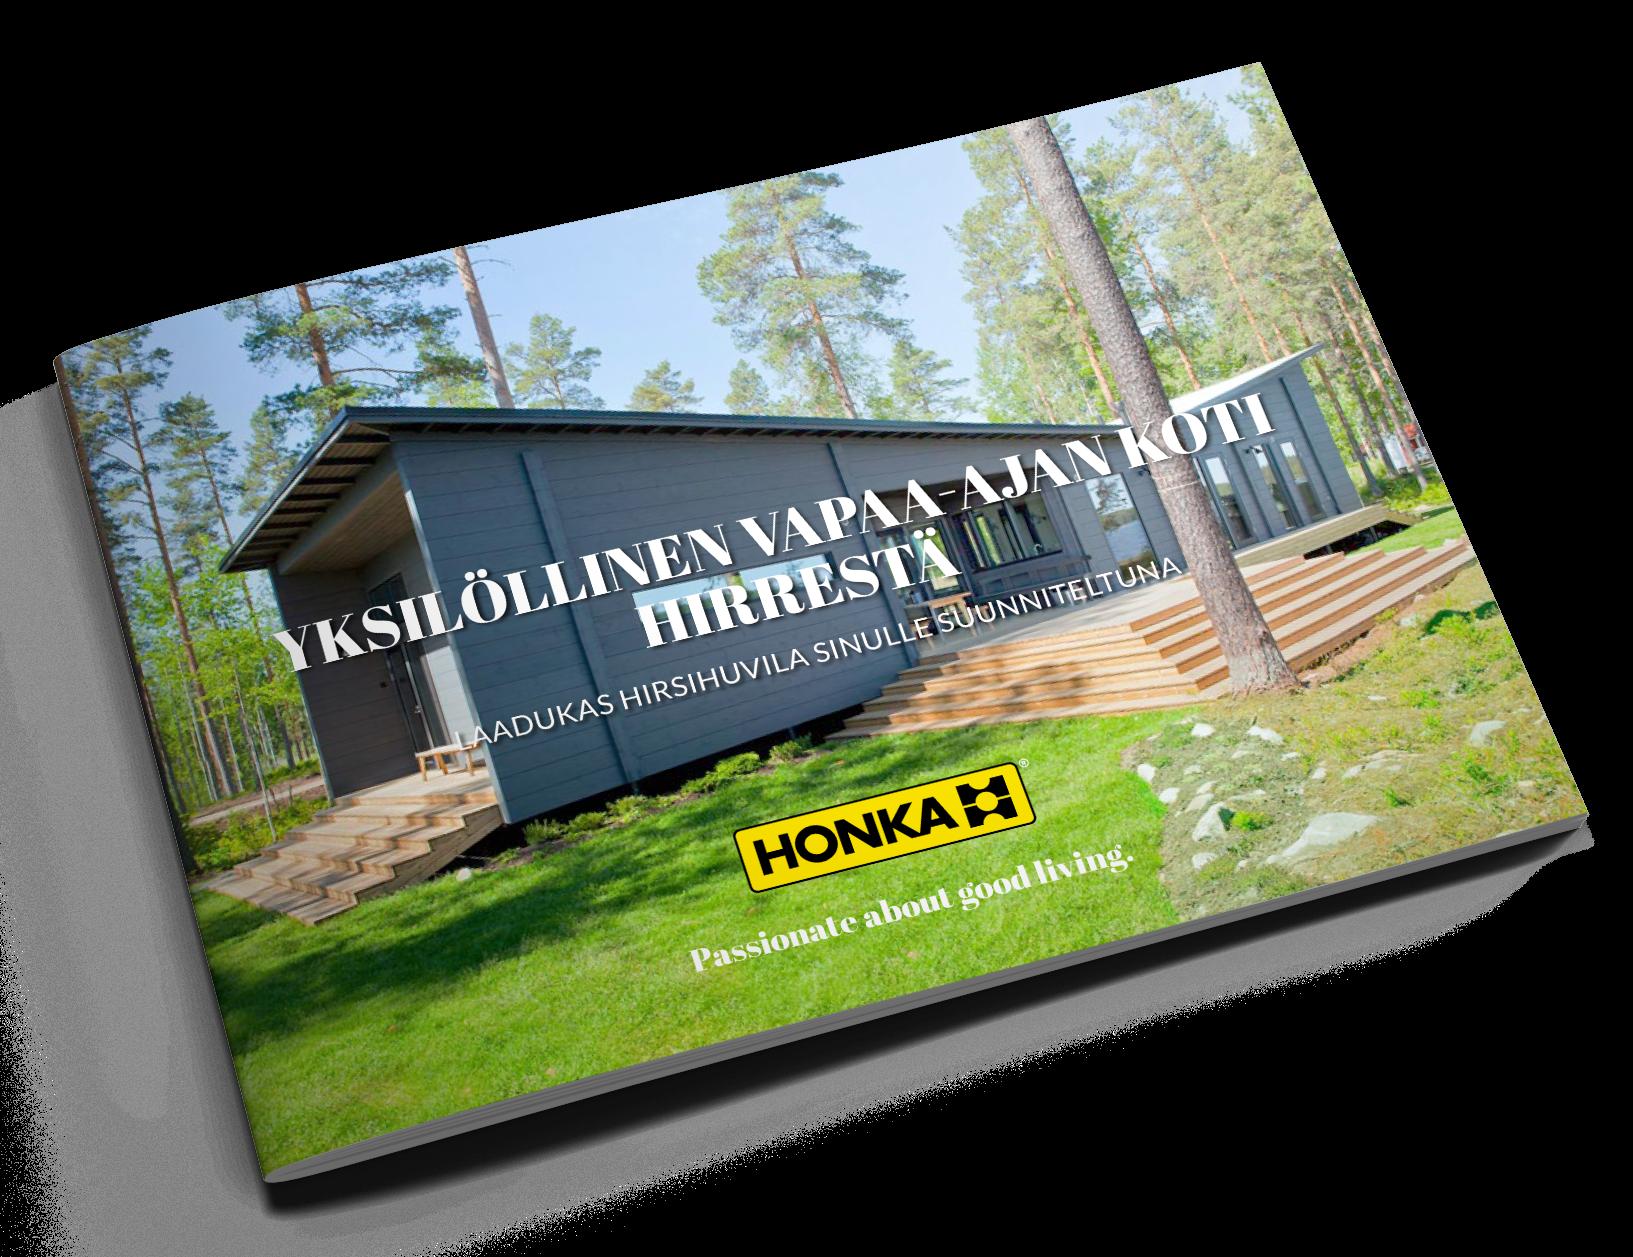 Honka-Yksilollinen-hirsihuvila-cover.png